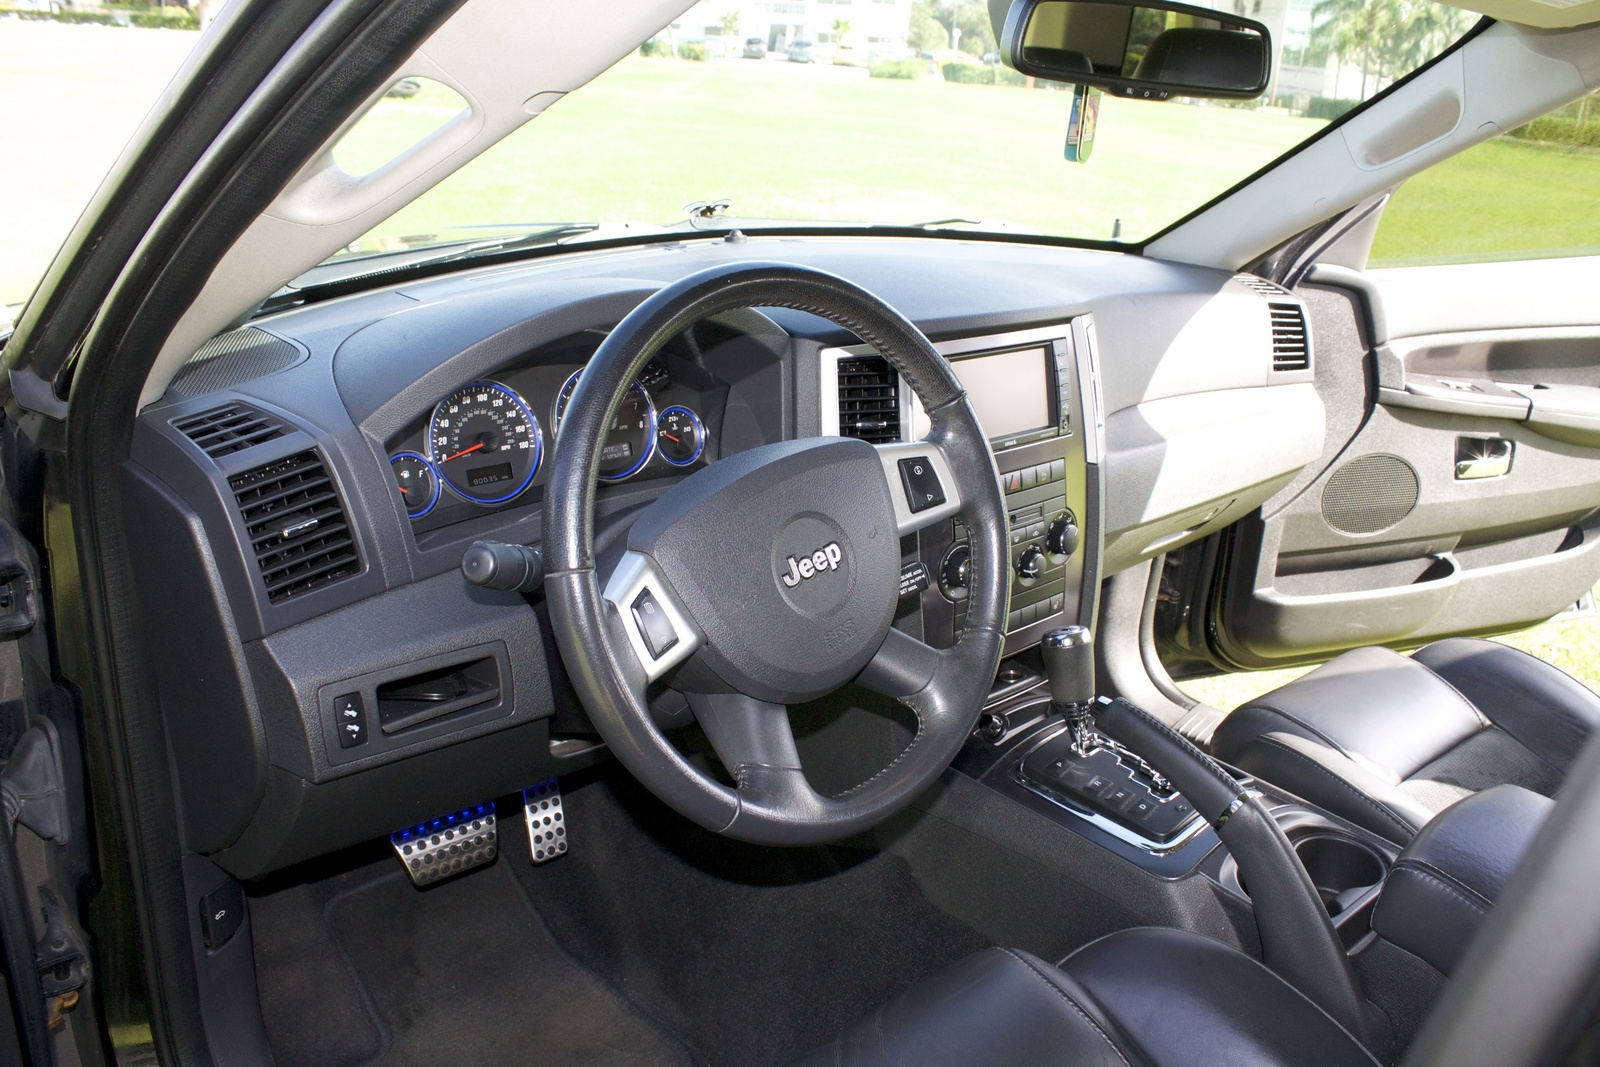 2008 Jeep Grand Cherokee CarGurus